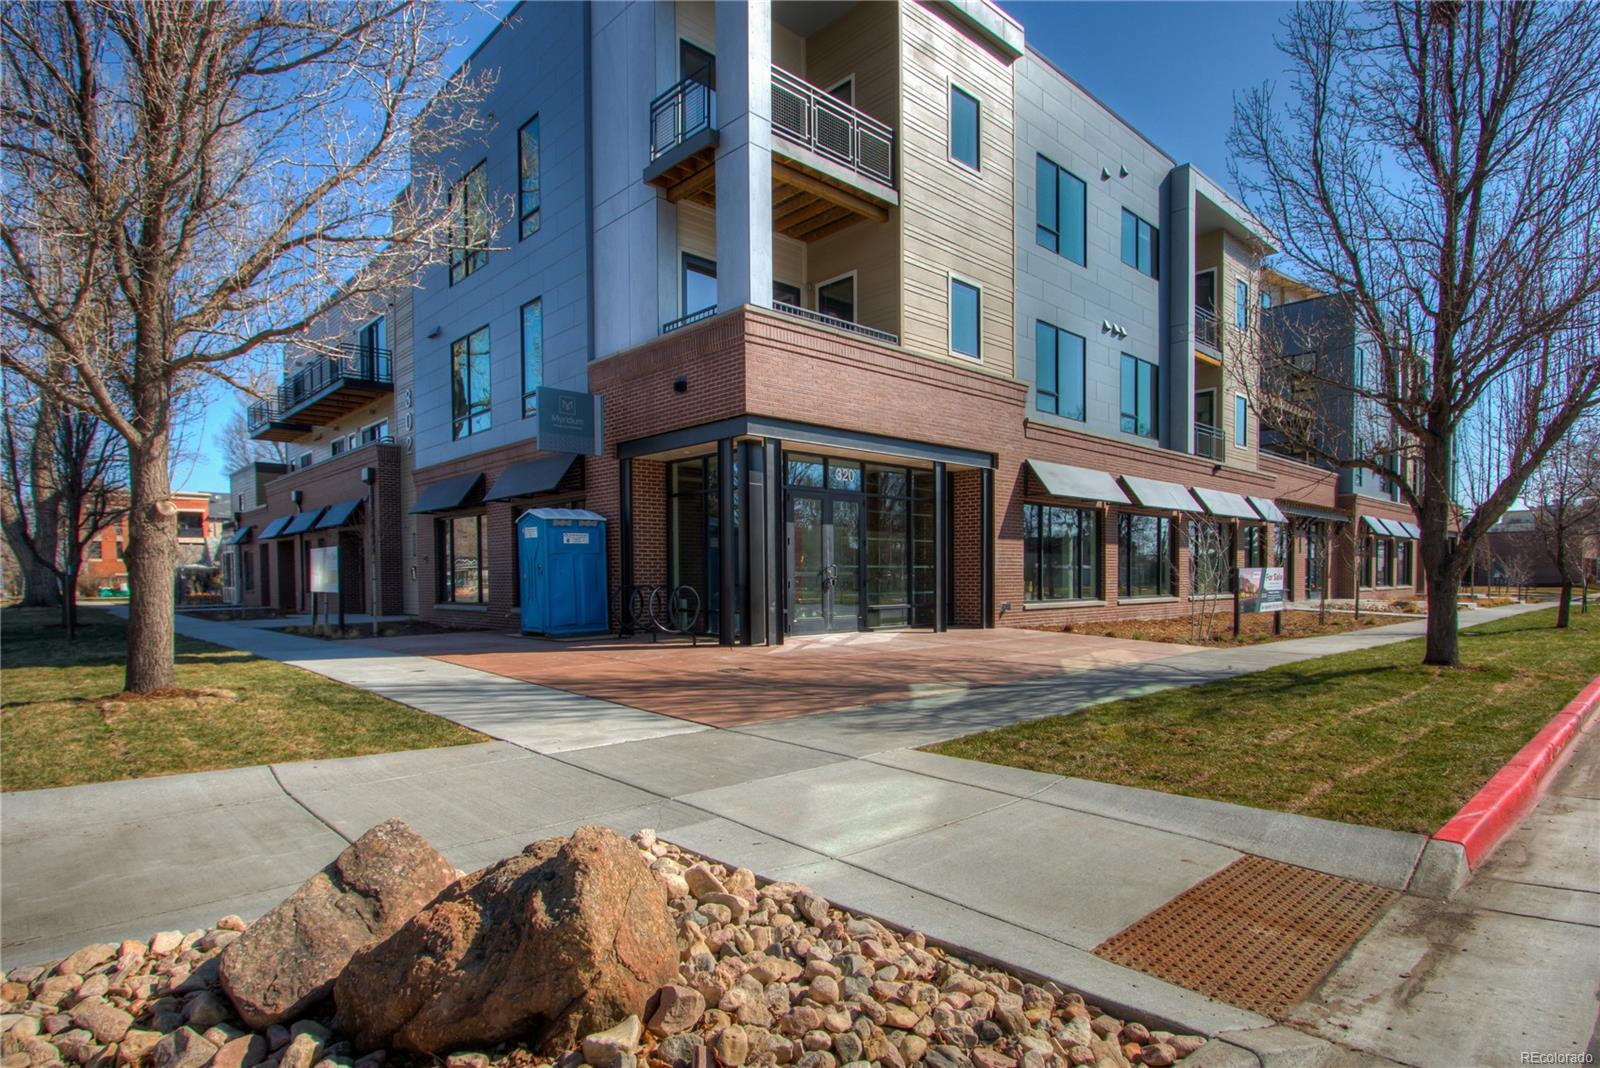 302 N Meldrum Street #208, Fort Collins, CO 80521 - Fort Collins, CO real estate listing